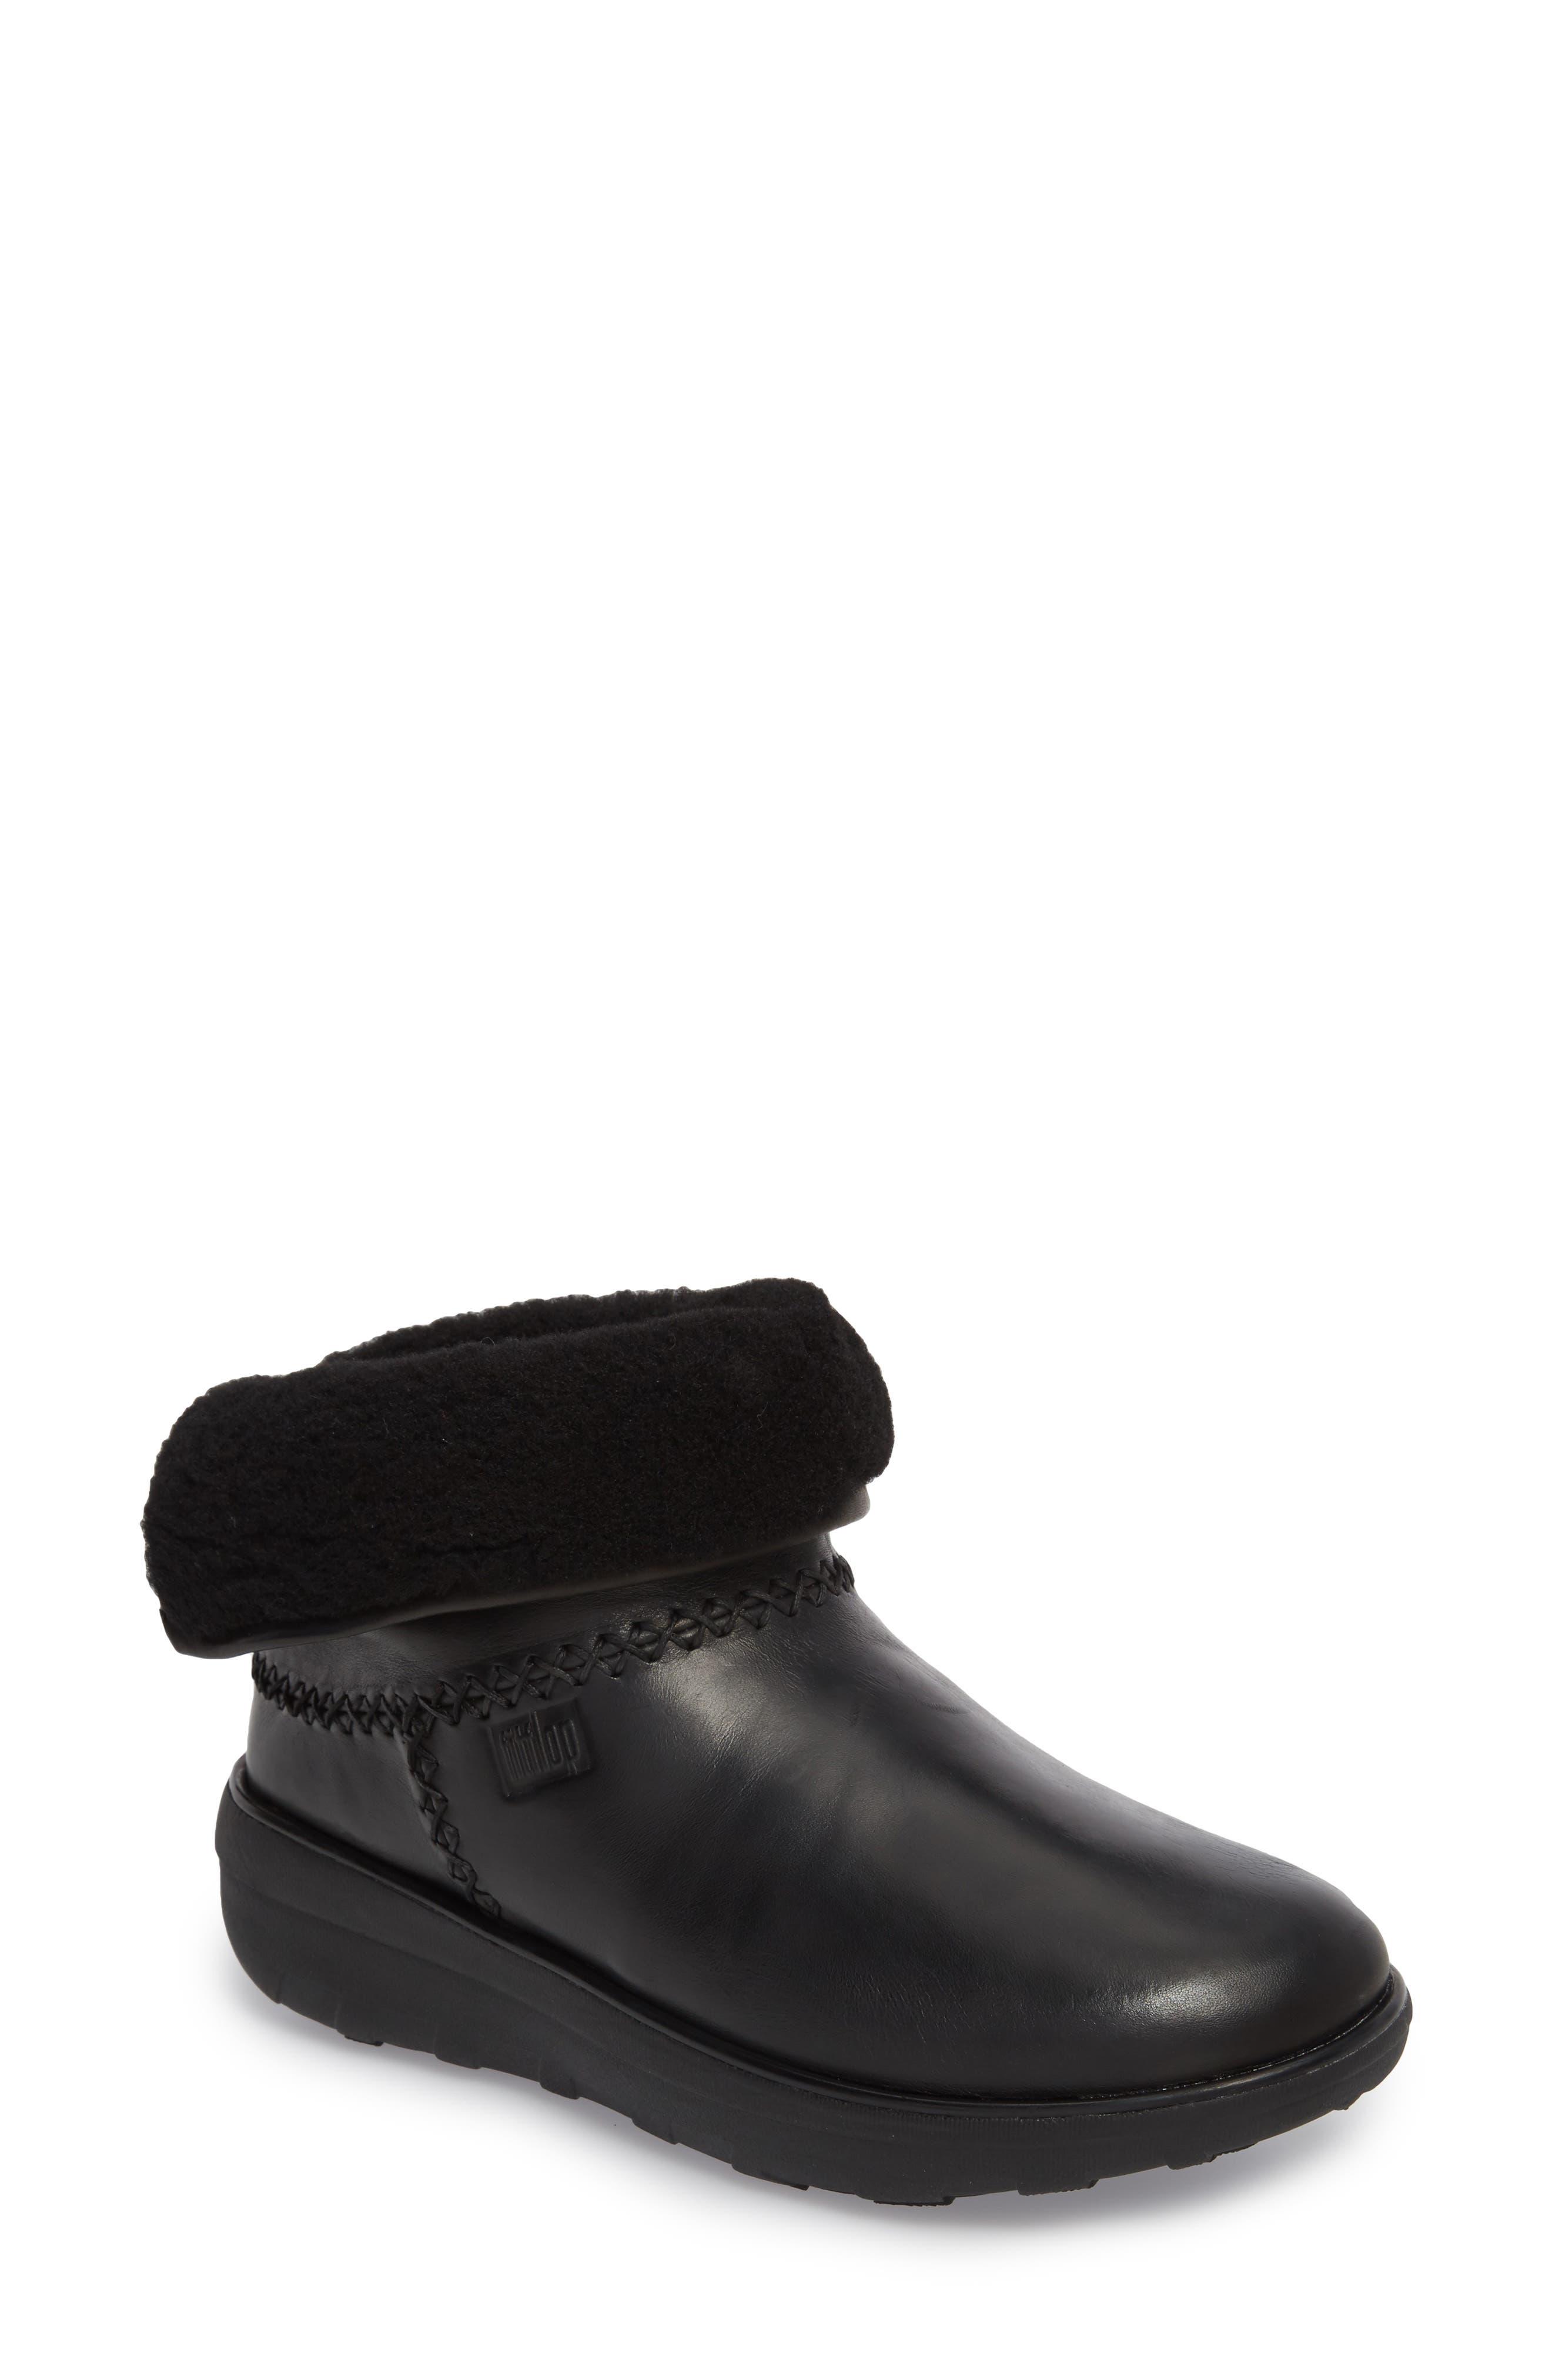 Mukluk Shorty II Boot,                             Main thumbnail 1, color,                             001